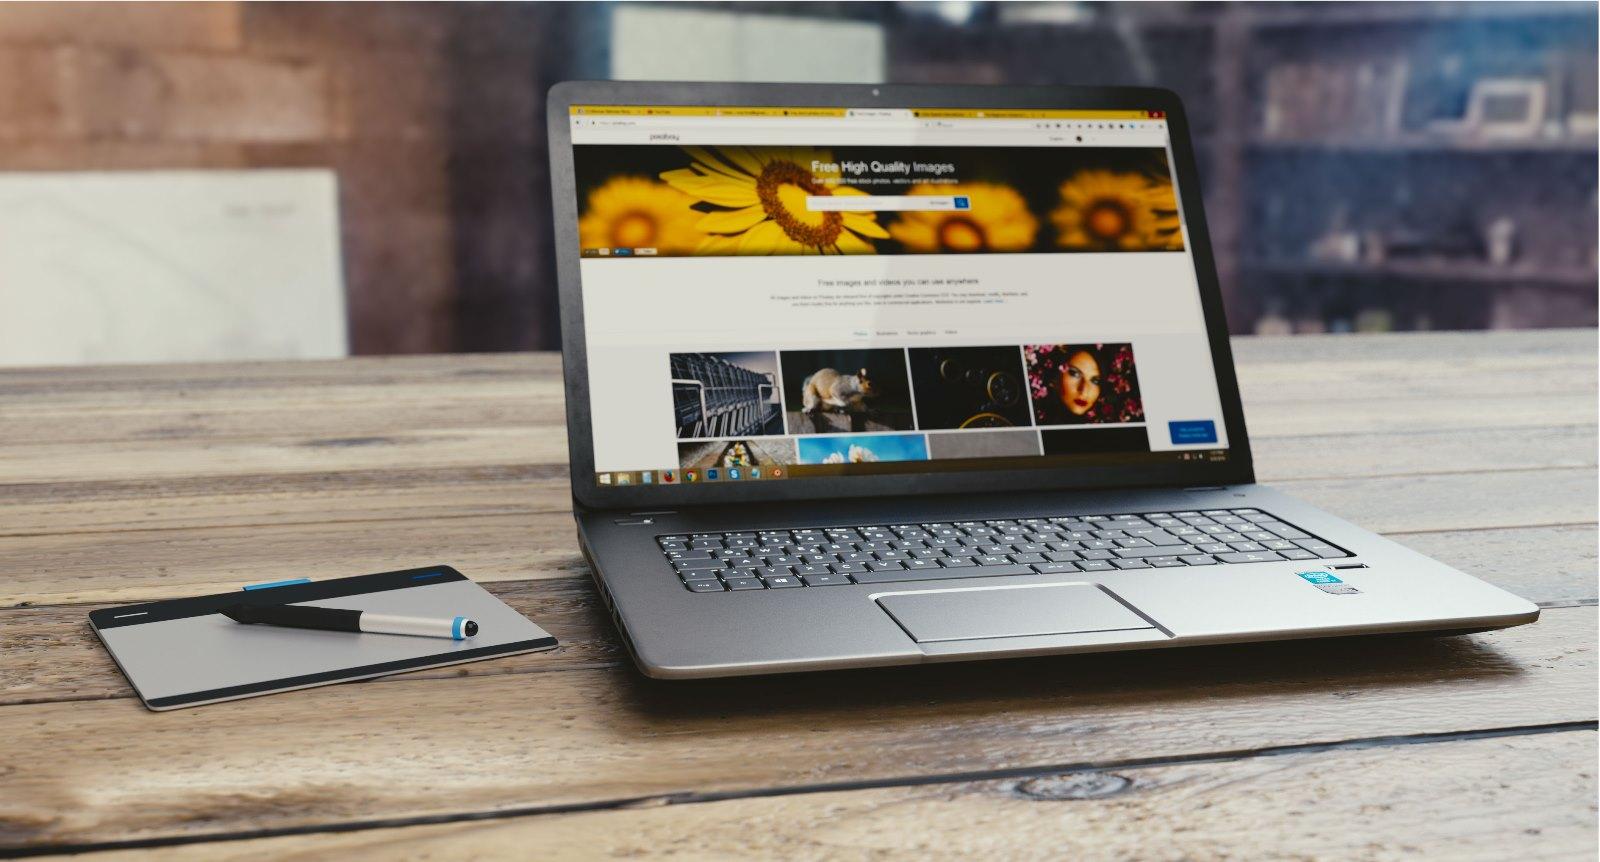 Cum verifici o tastatura pentru laptop inainte de a cumpara echipamentul?